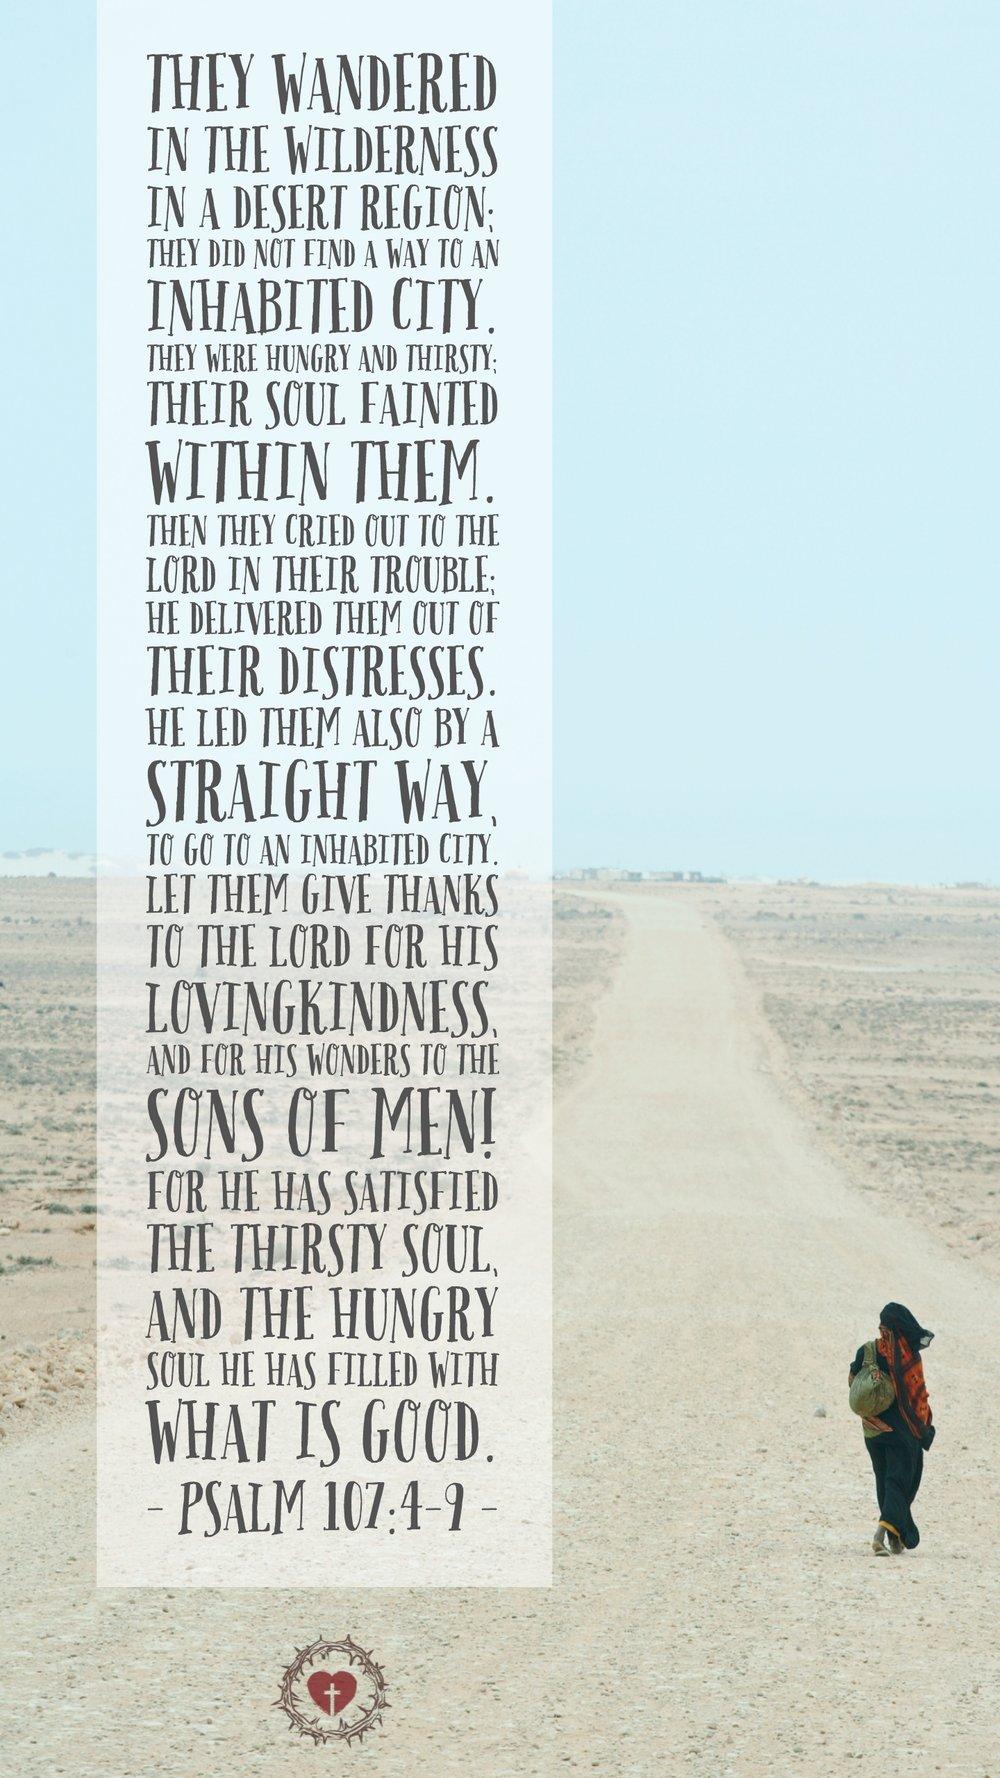 Psalm107-4-9.jpg